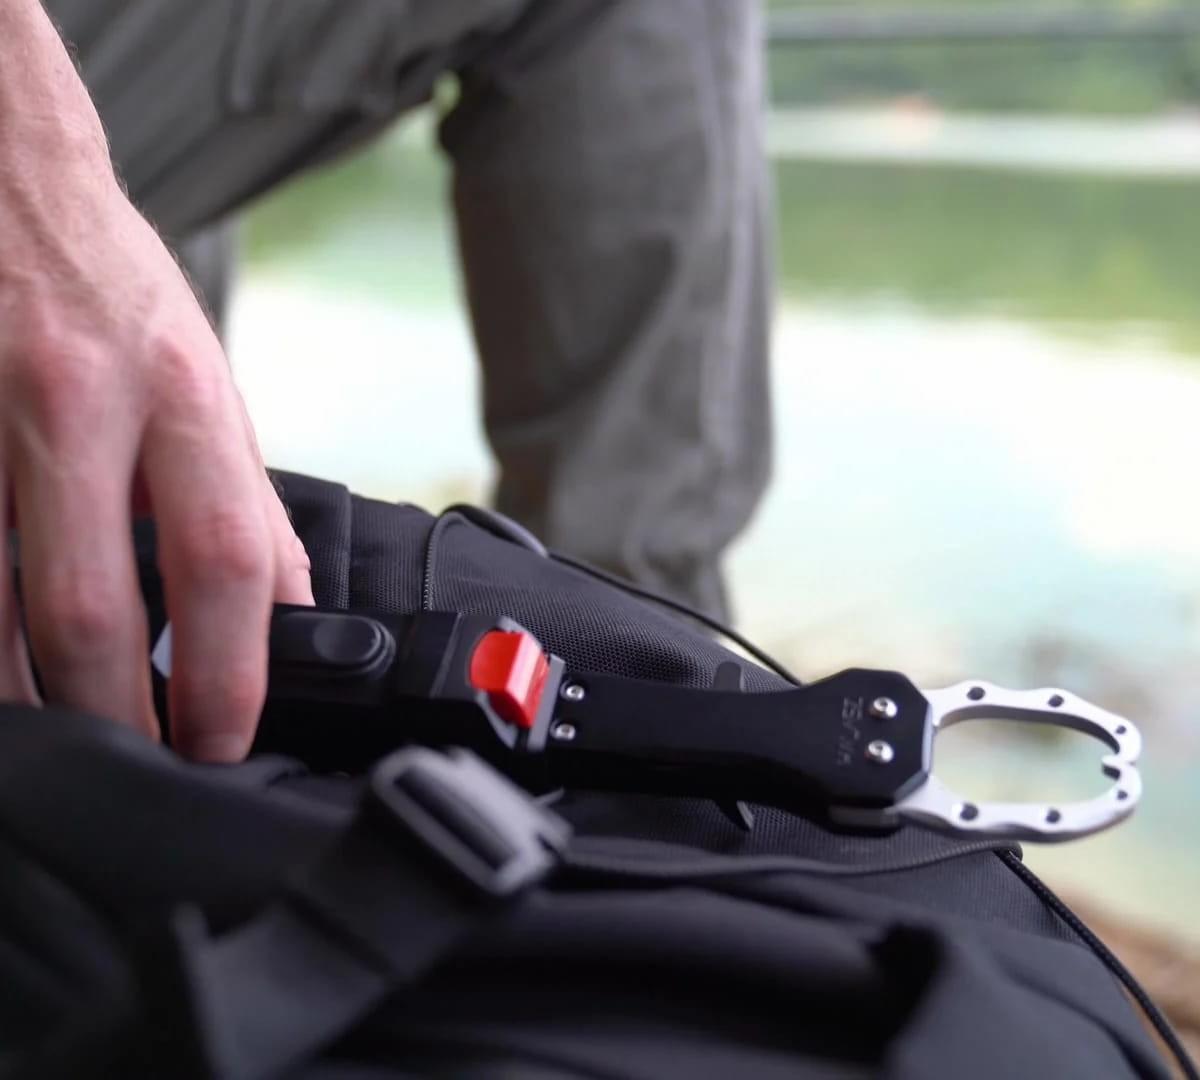 Halasz multifunctional fishing grip provides real-time information through an app